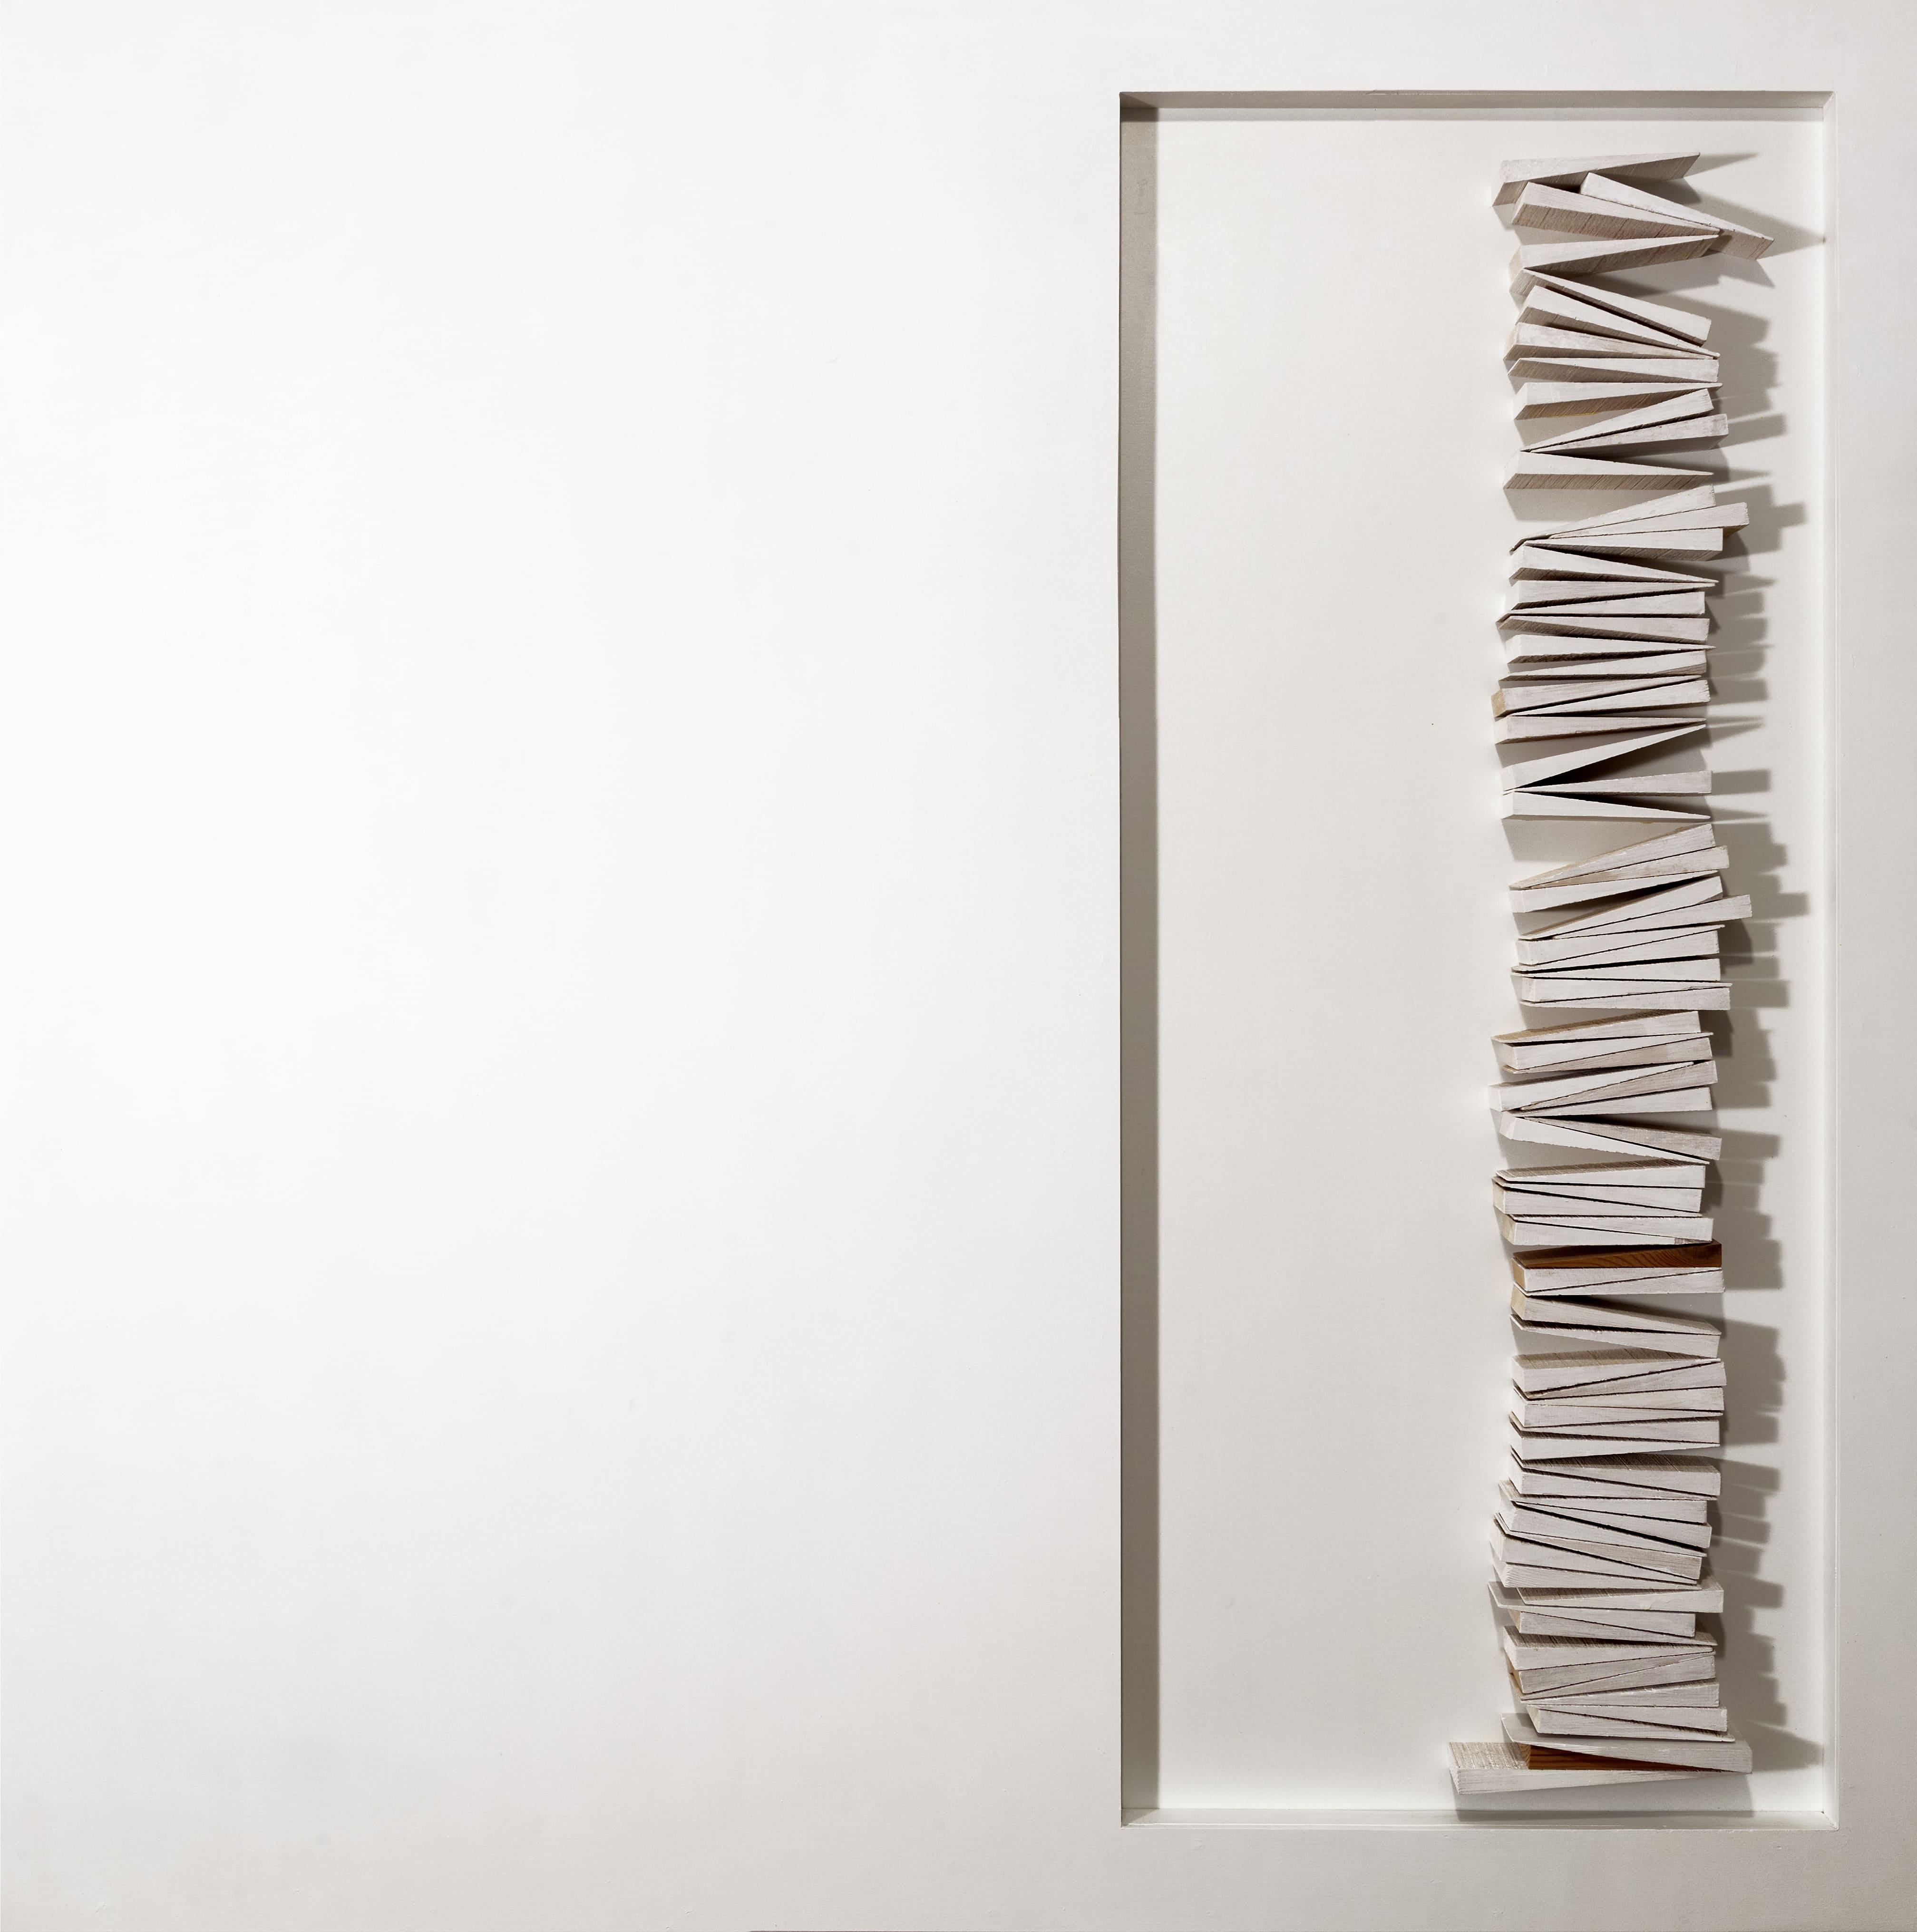 Cuñas vertical I (2014) - Ne Cano